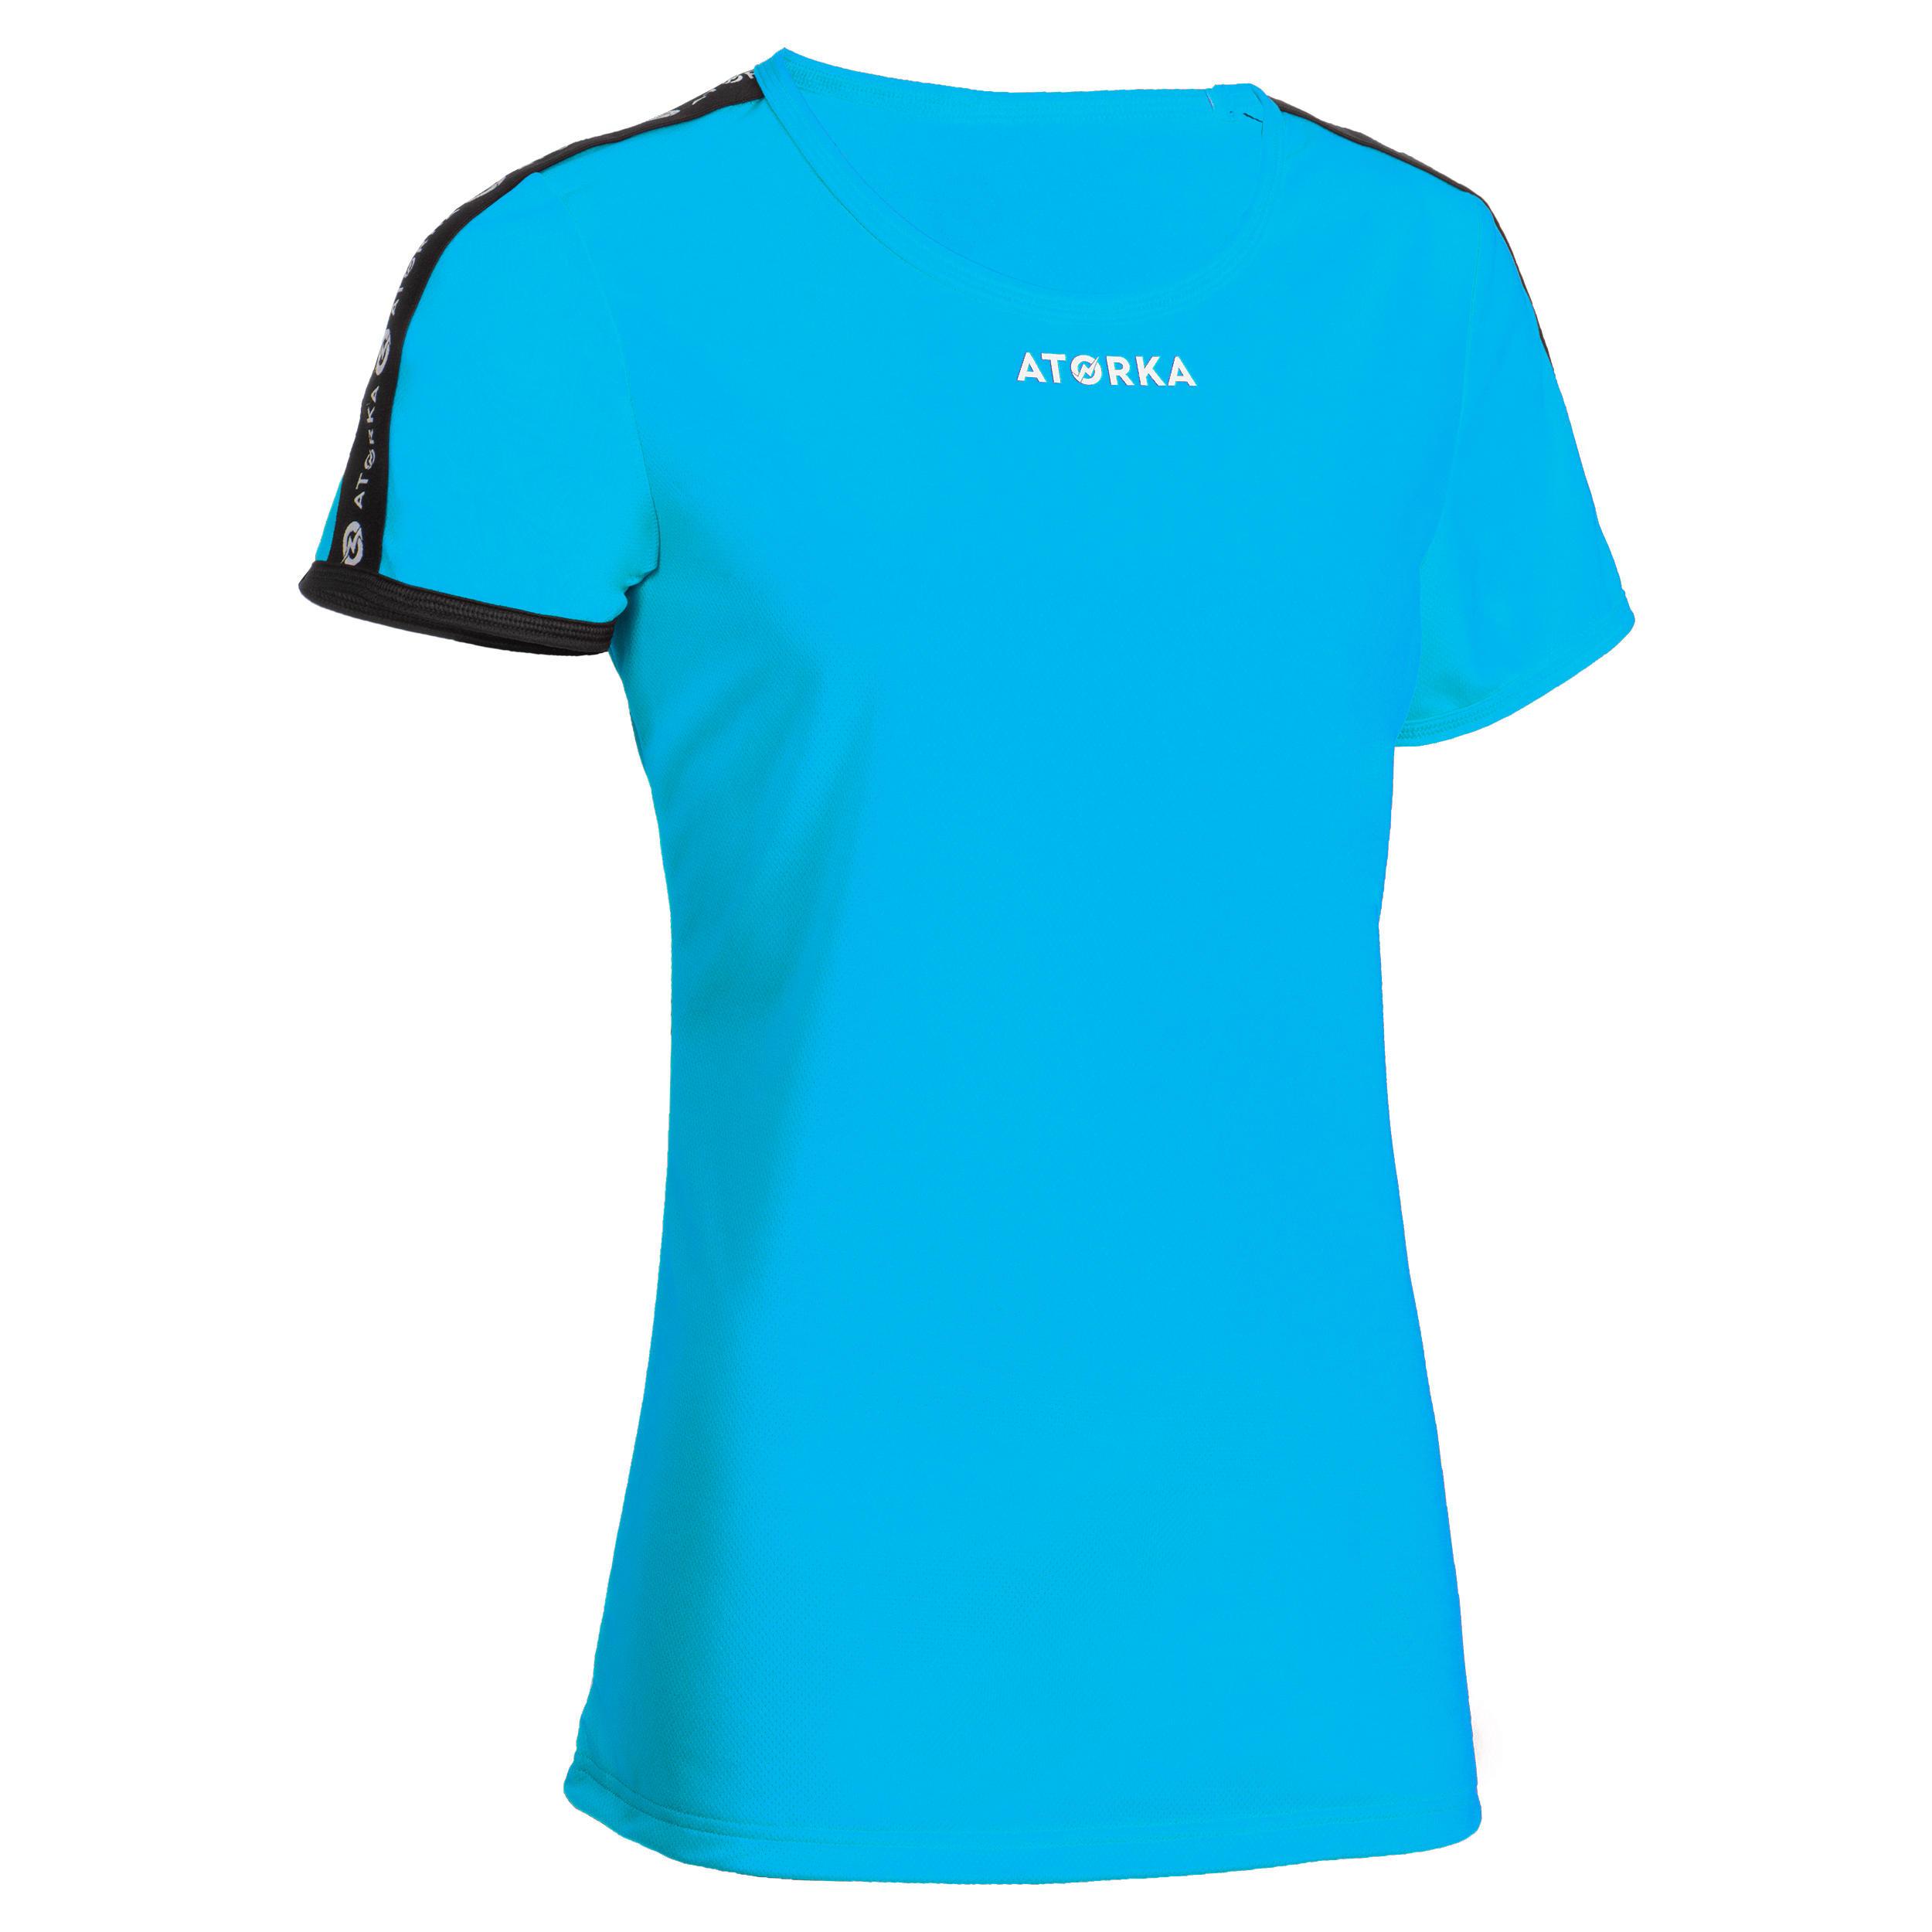 Handballtrikot Kurzarm H100C Damen | Sportbekleidung > Trikots > Handballtrikots | Atorka